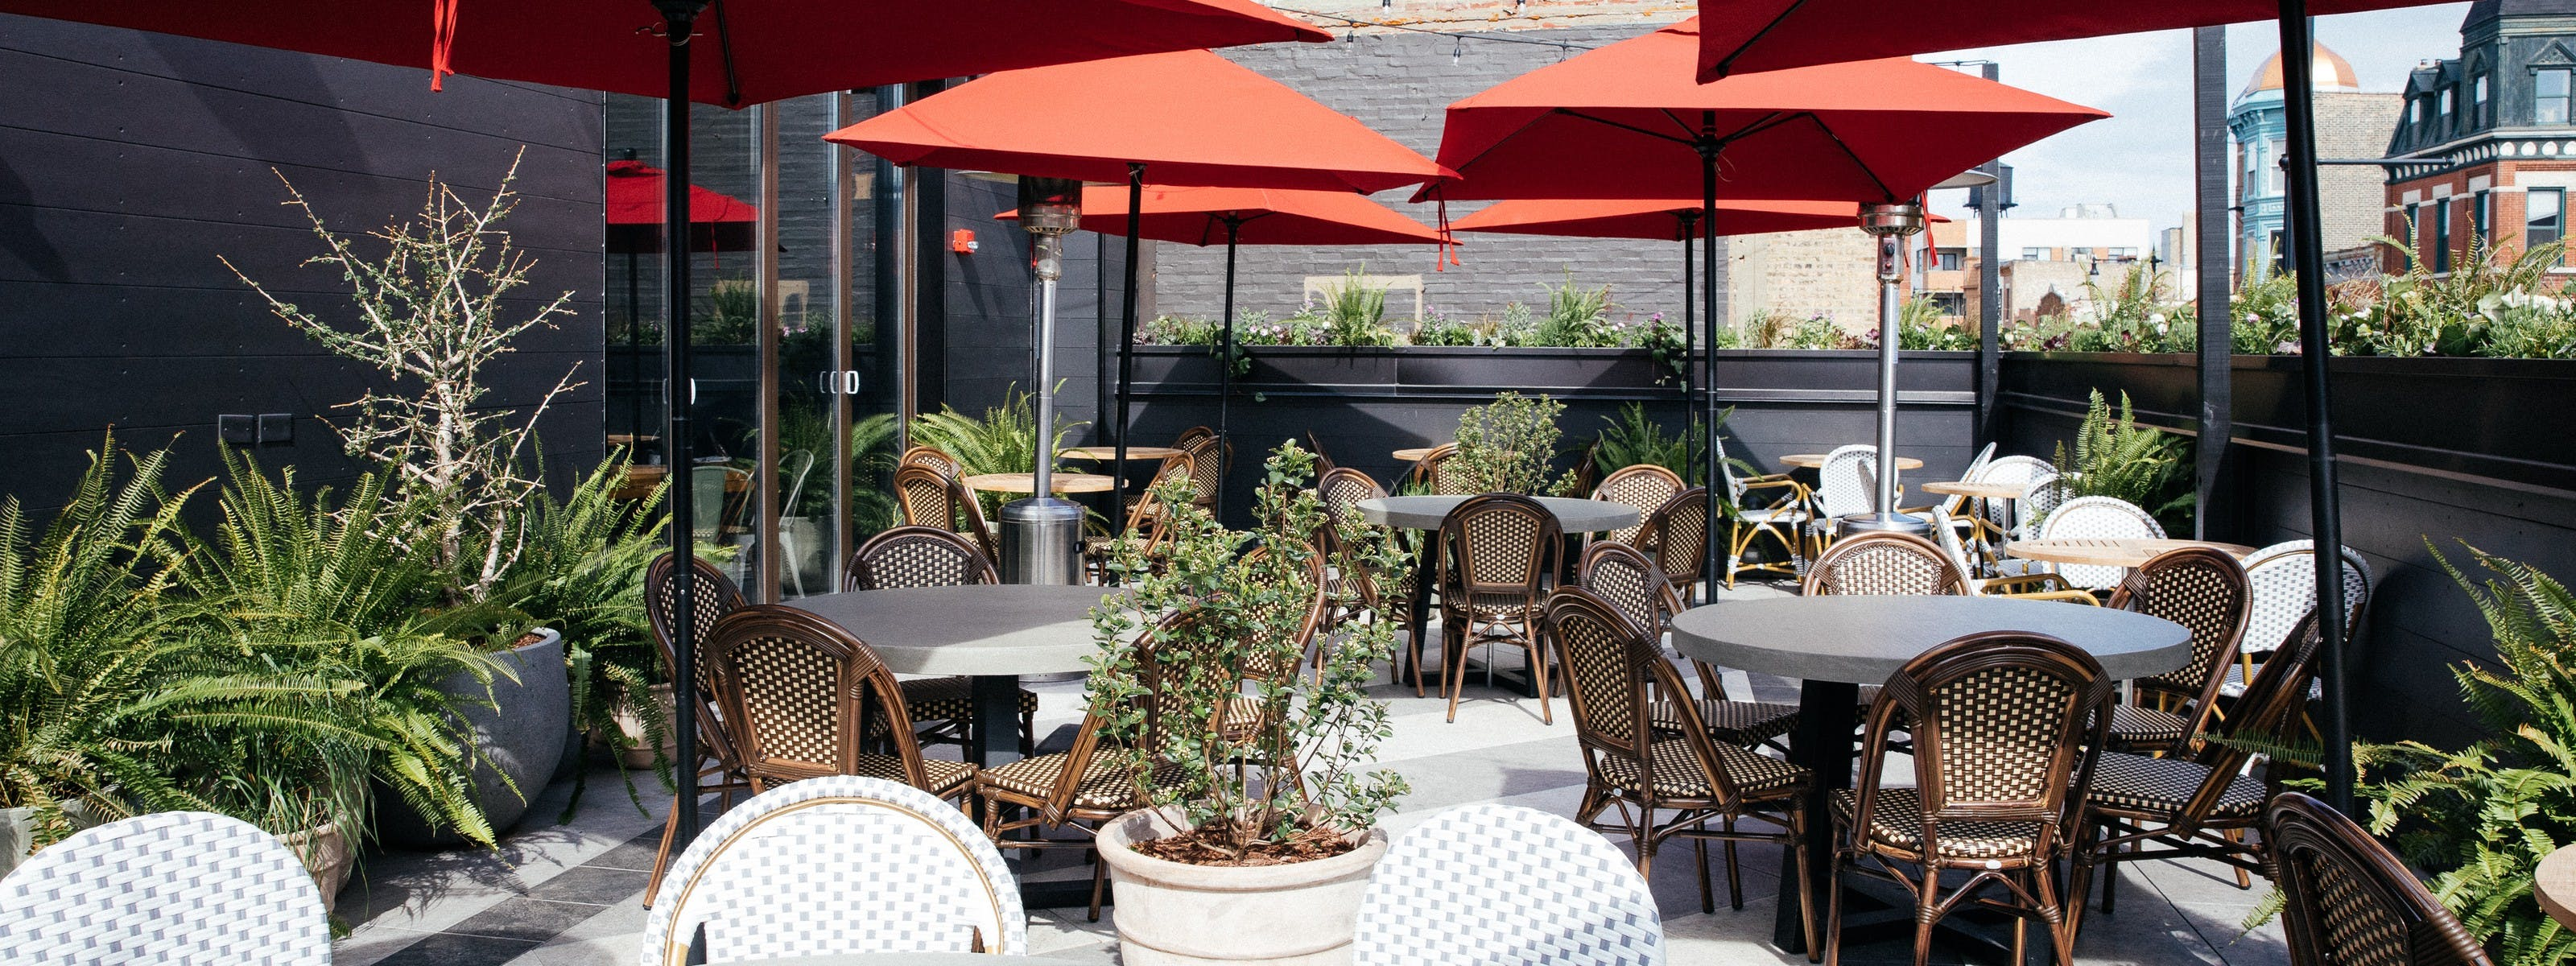 chicago restaurants with outdoor